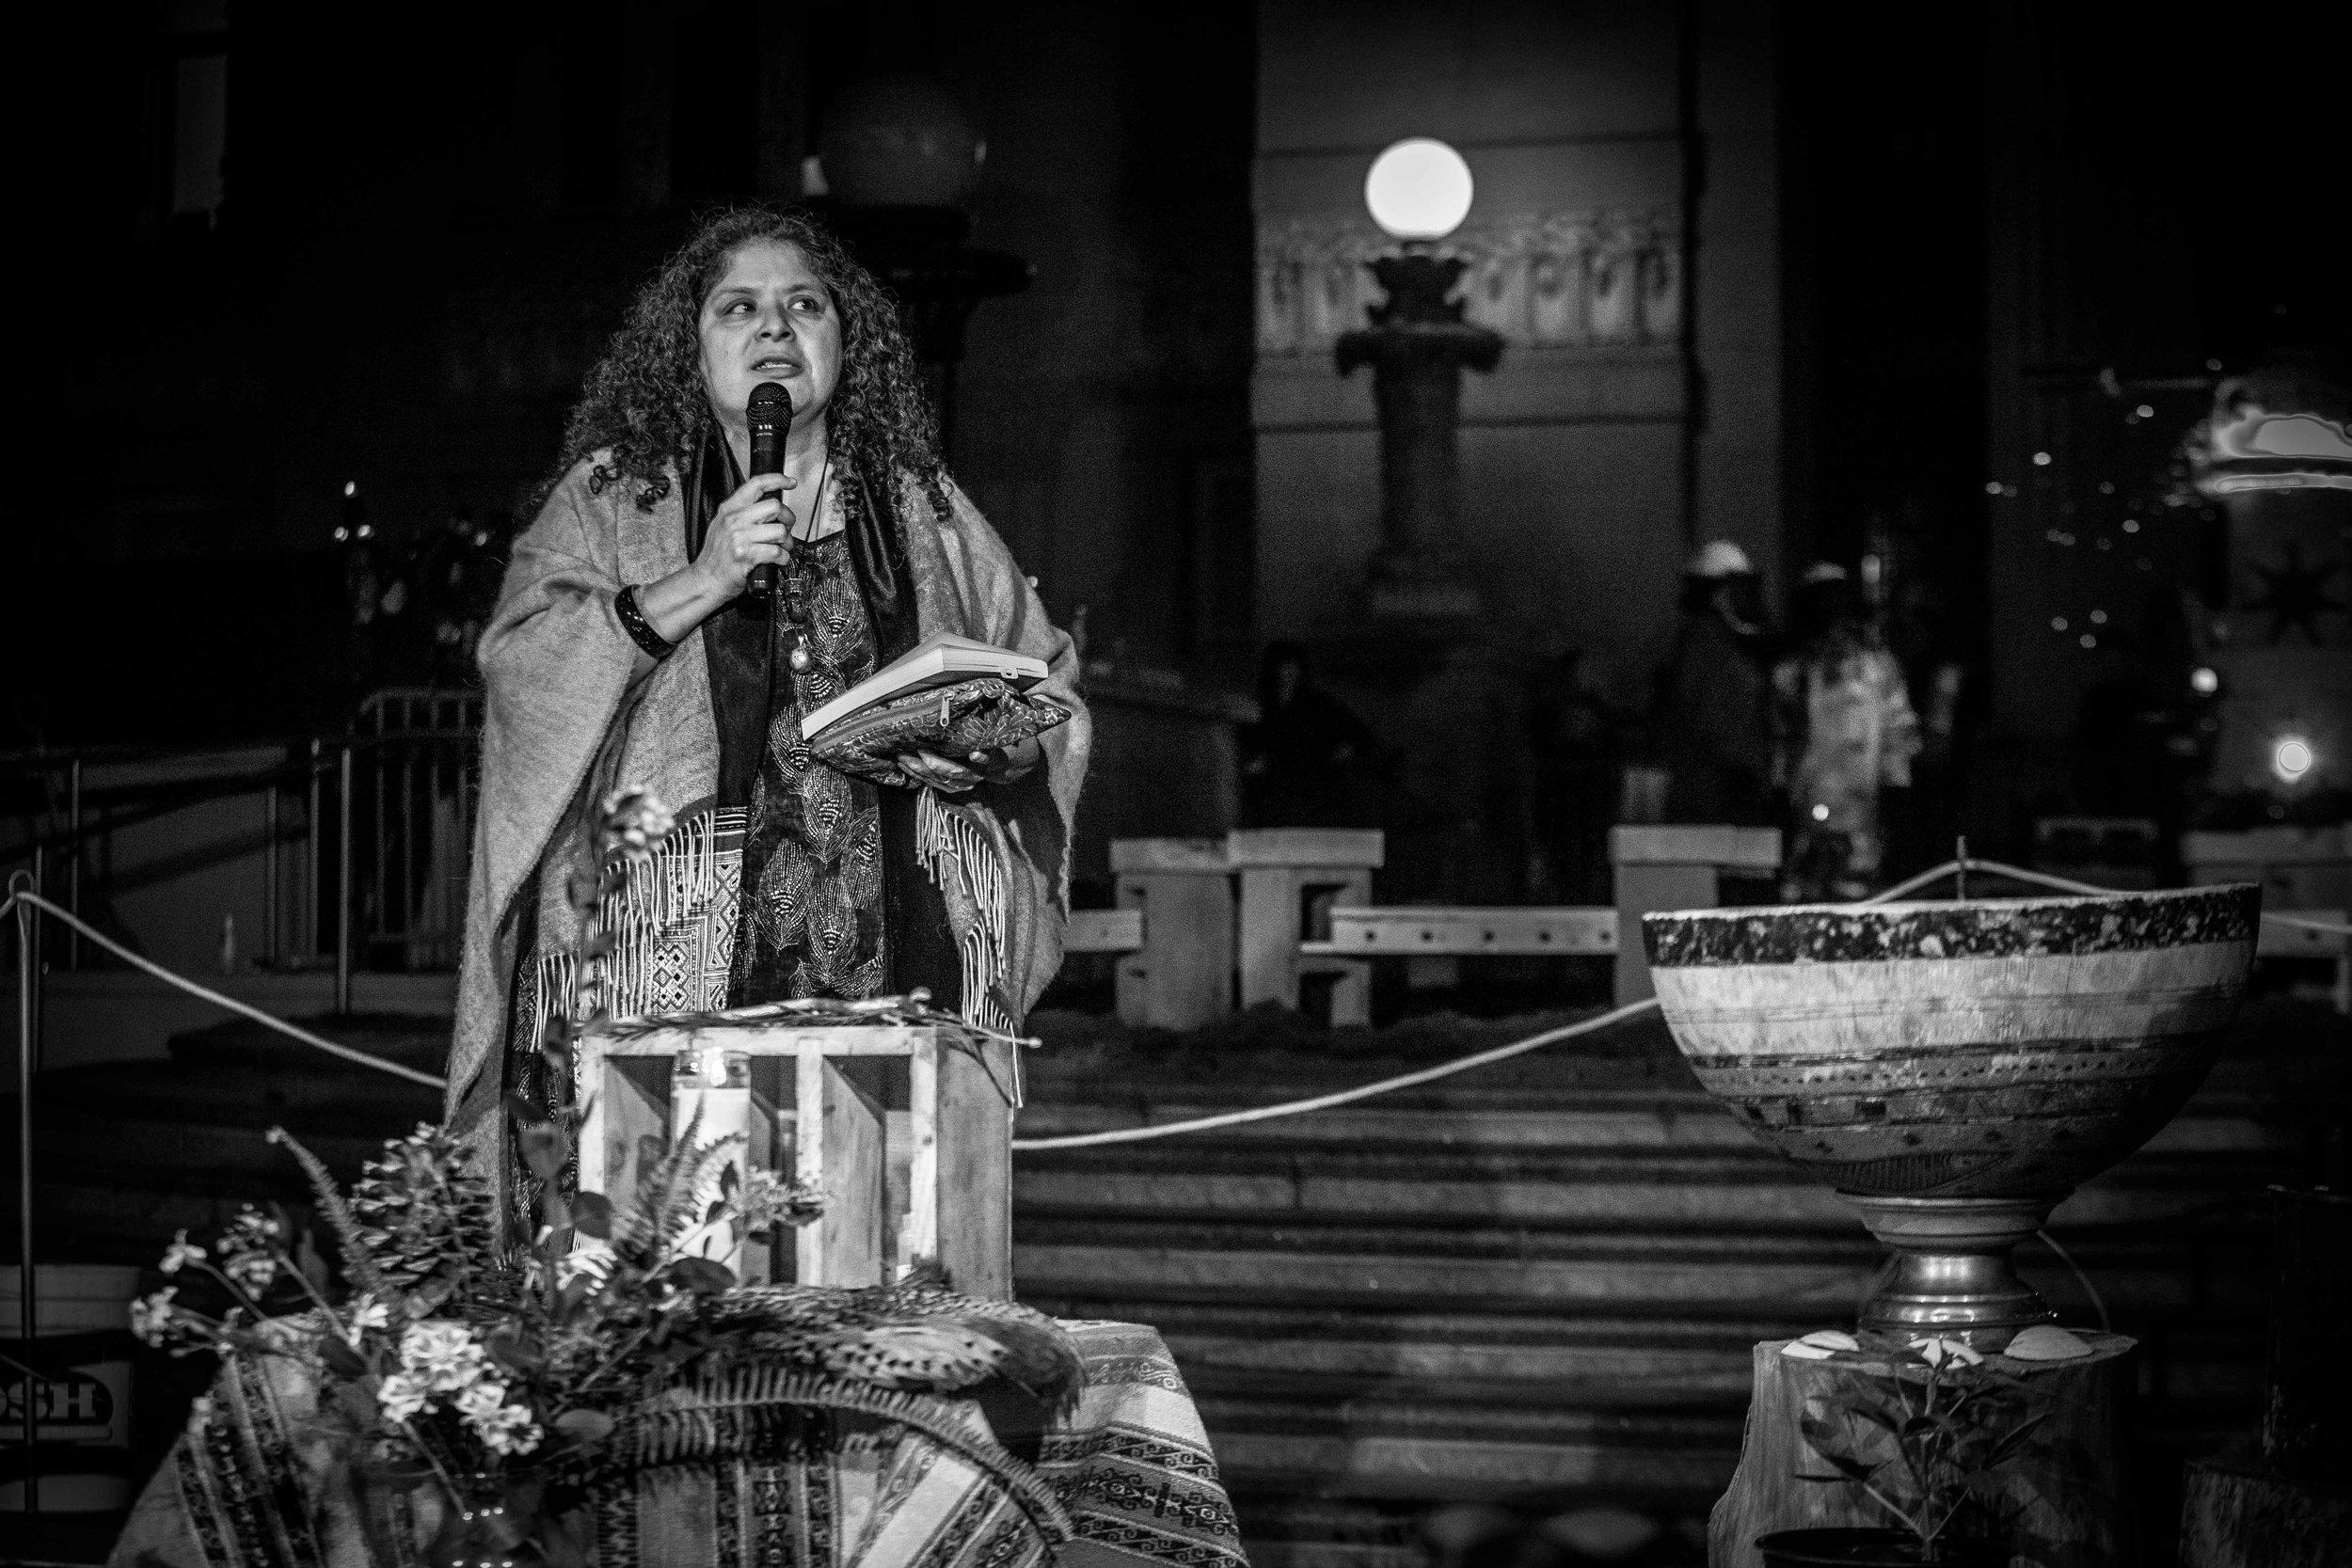 Brenda Salgado offers opening blessing